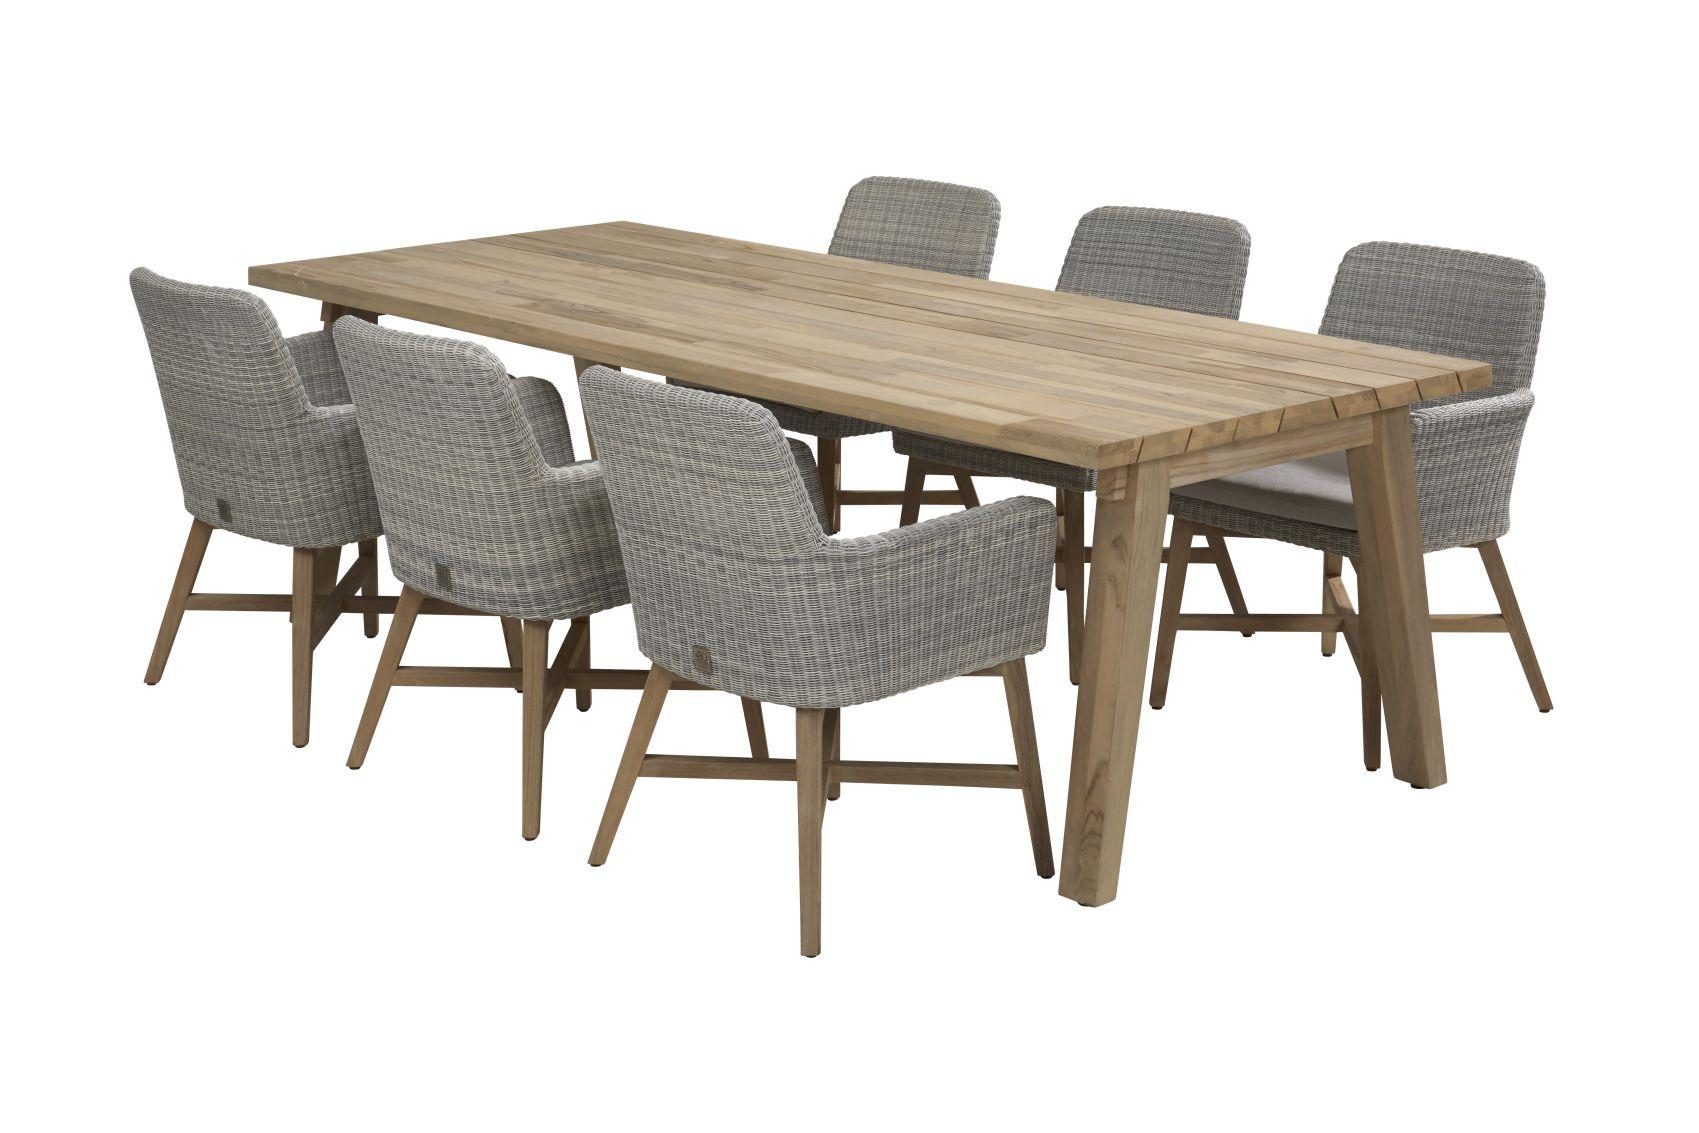 4 seasons outdoor lisboa diningset met derby dining tafel teak sale latour. Black Bedroom Furniture Sets. Home Design Ideas